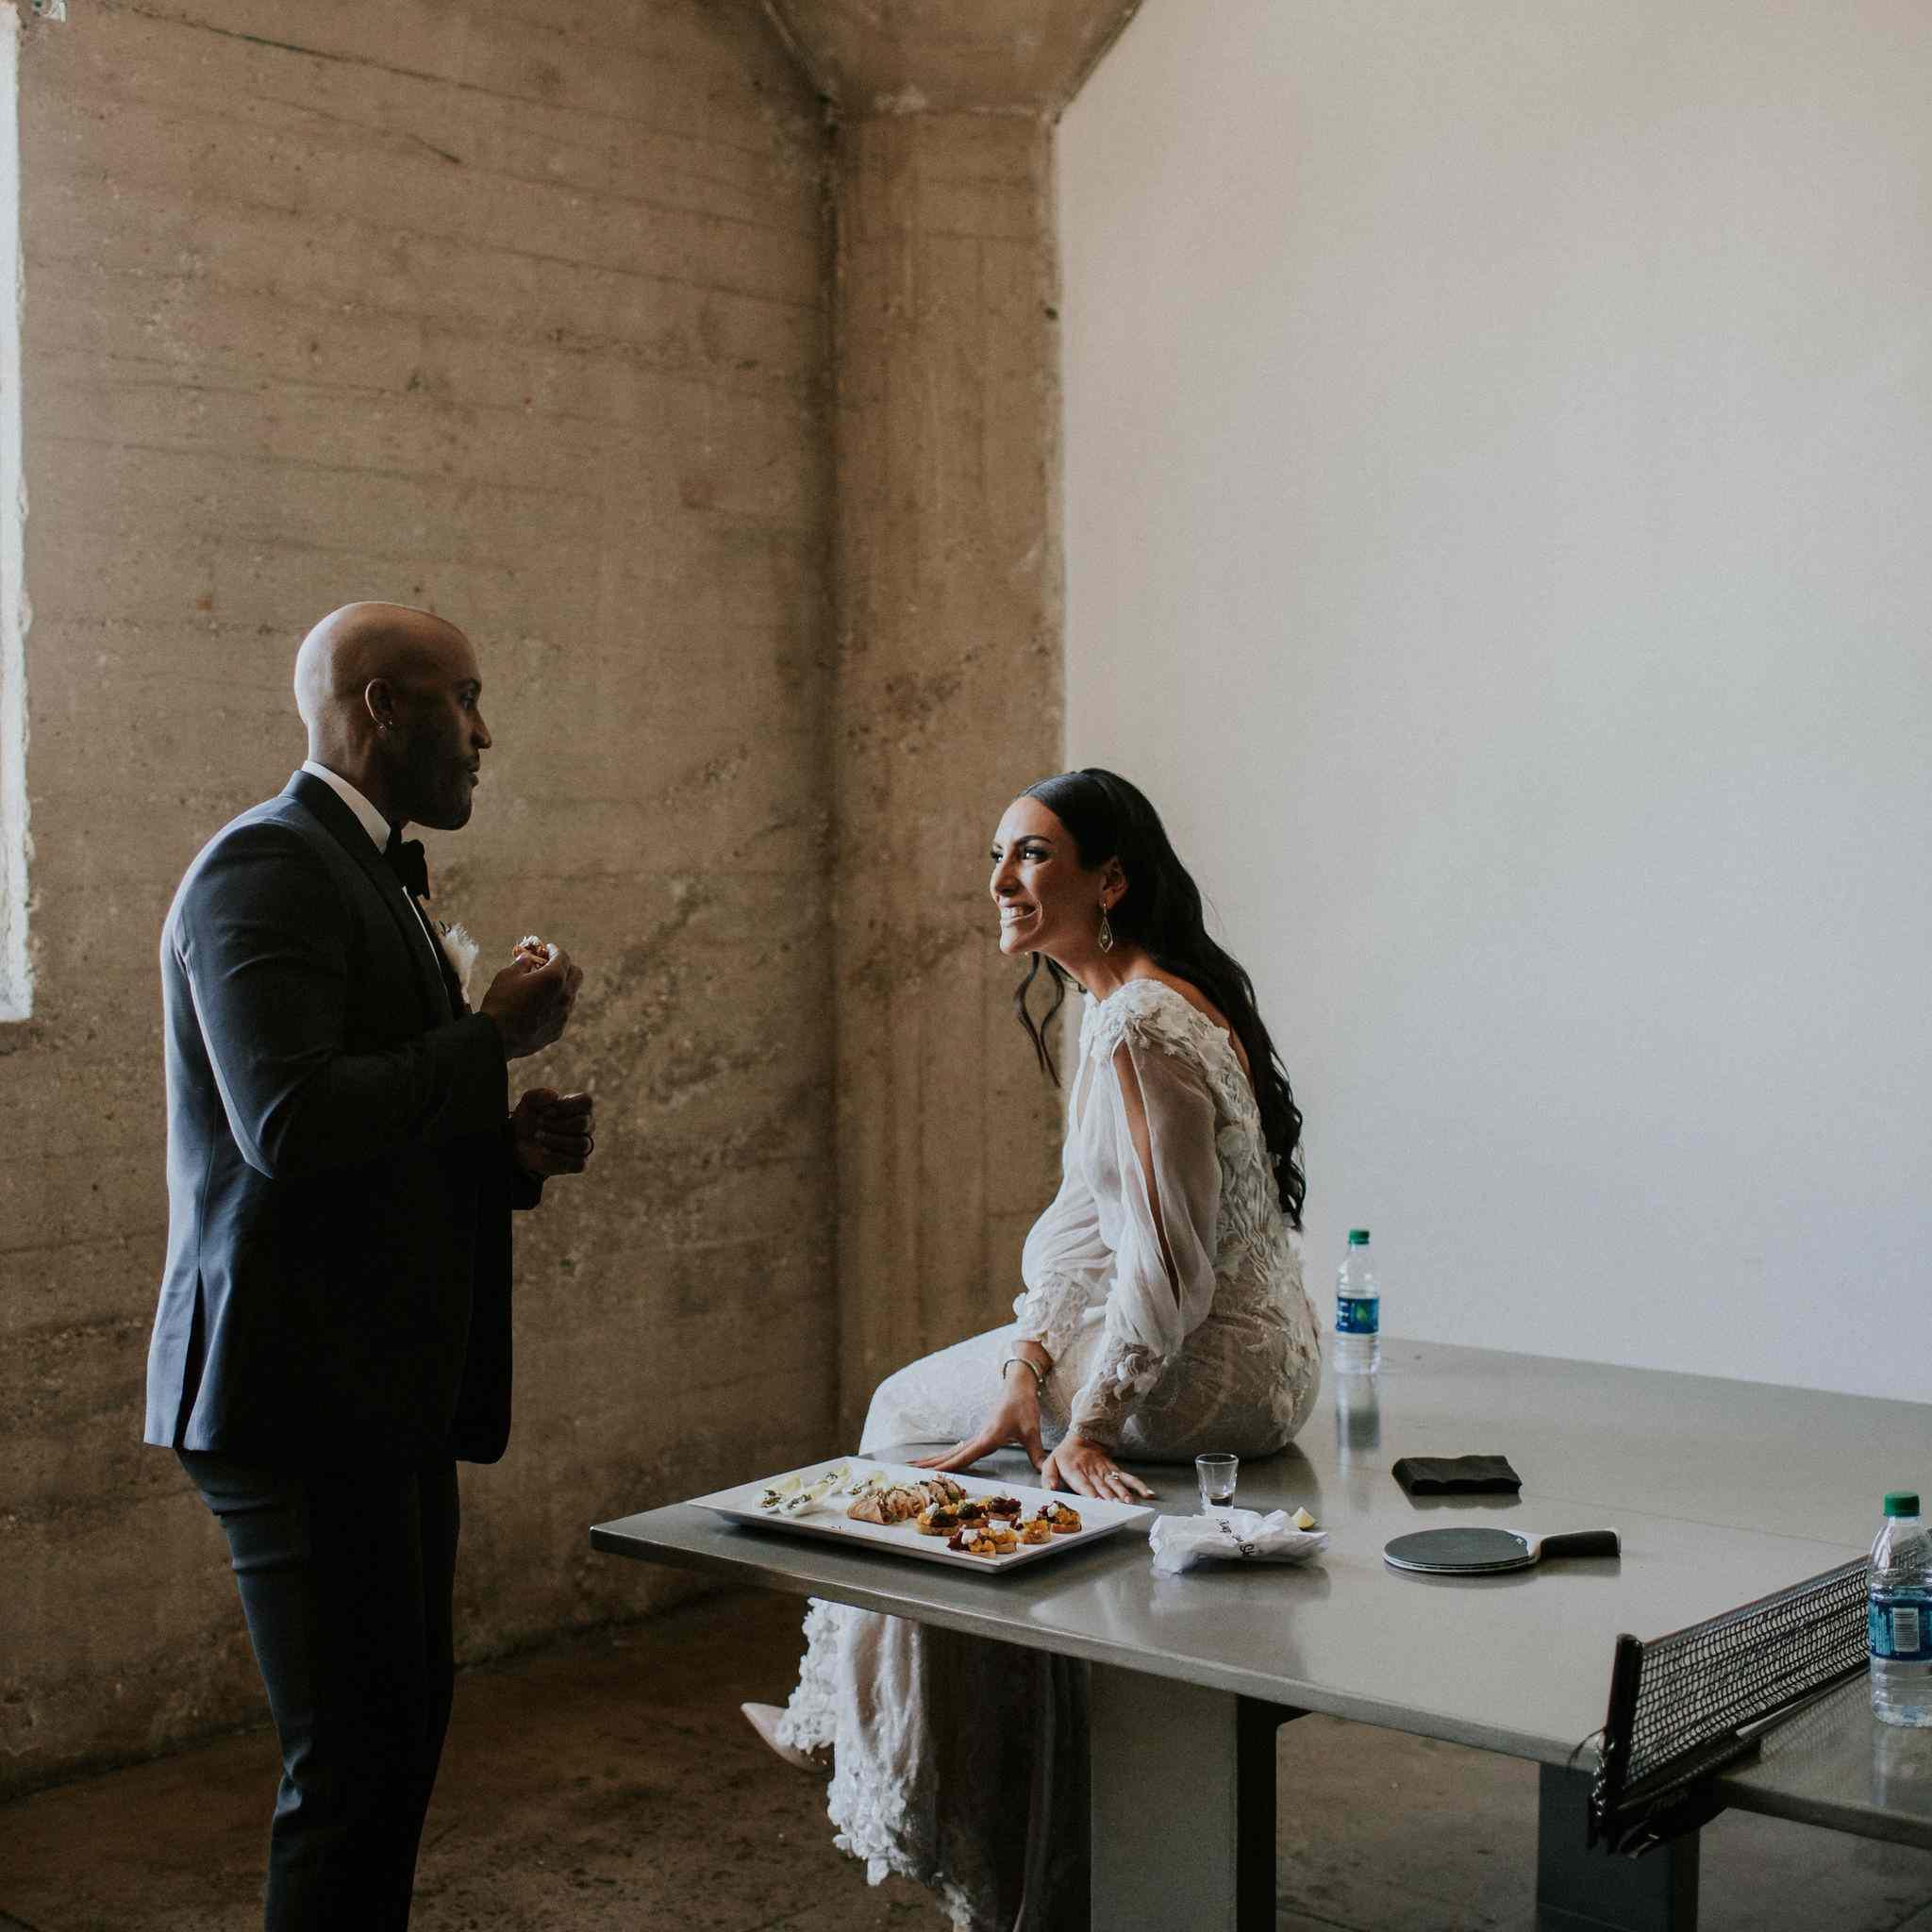 Bride and groom snacking between events